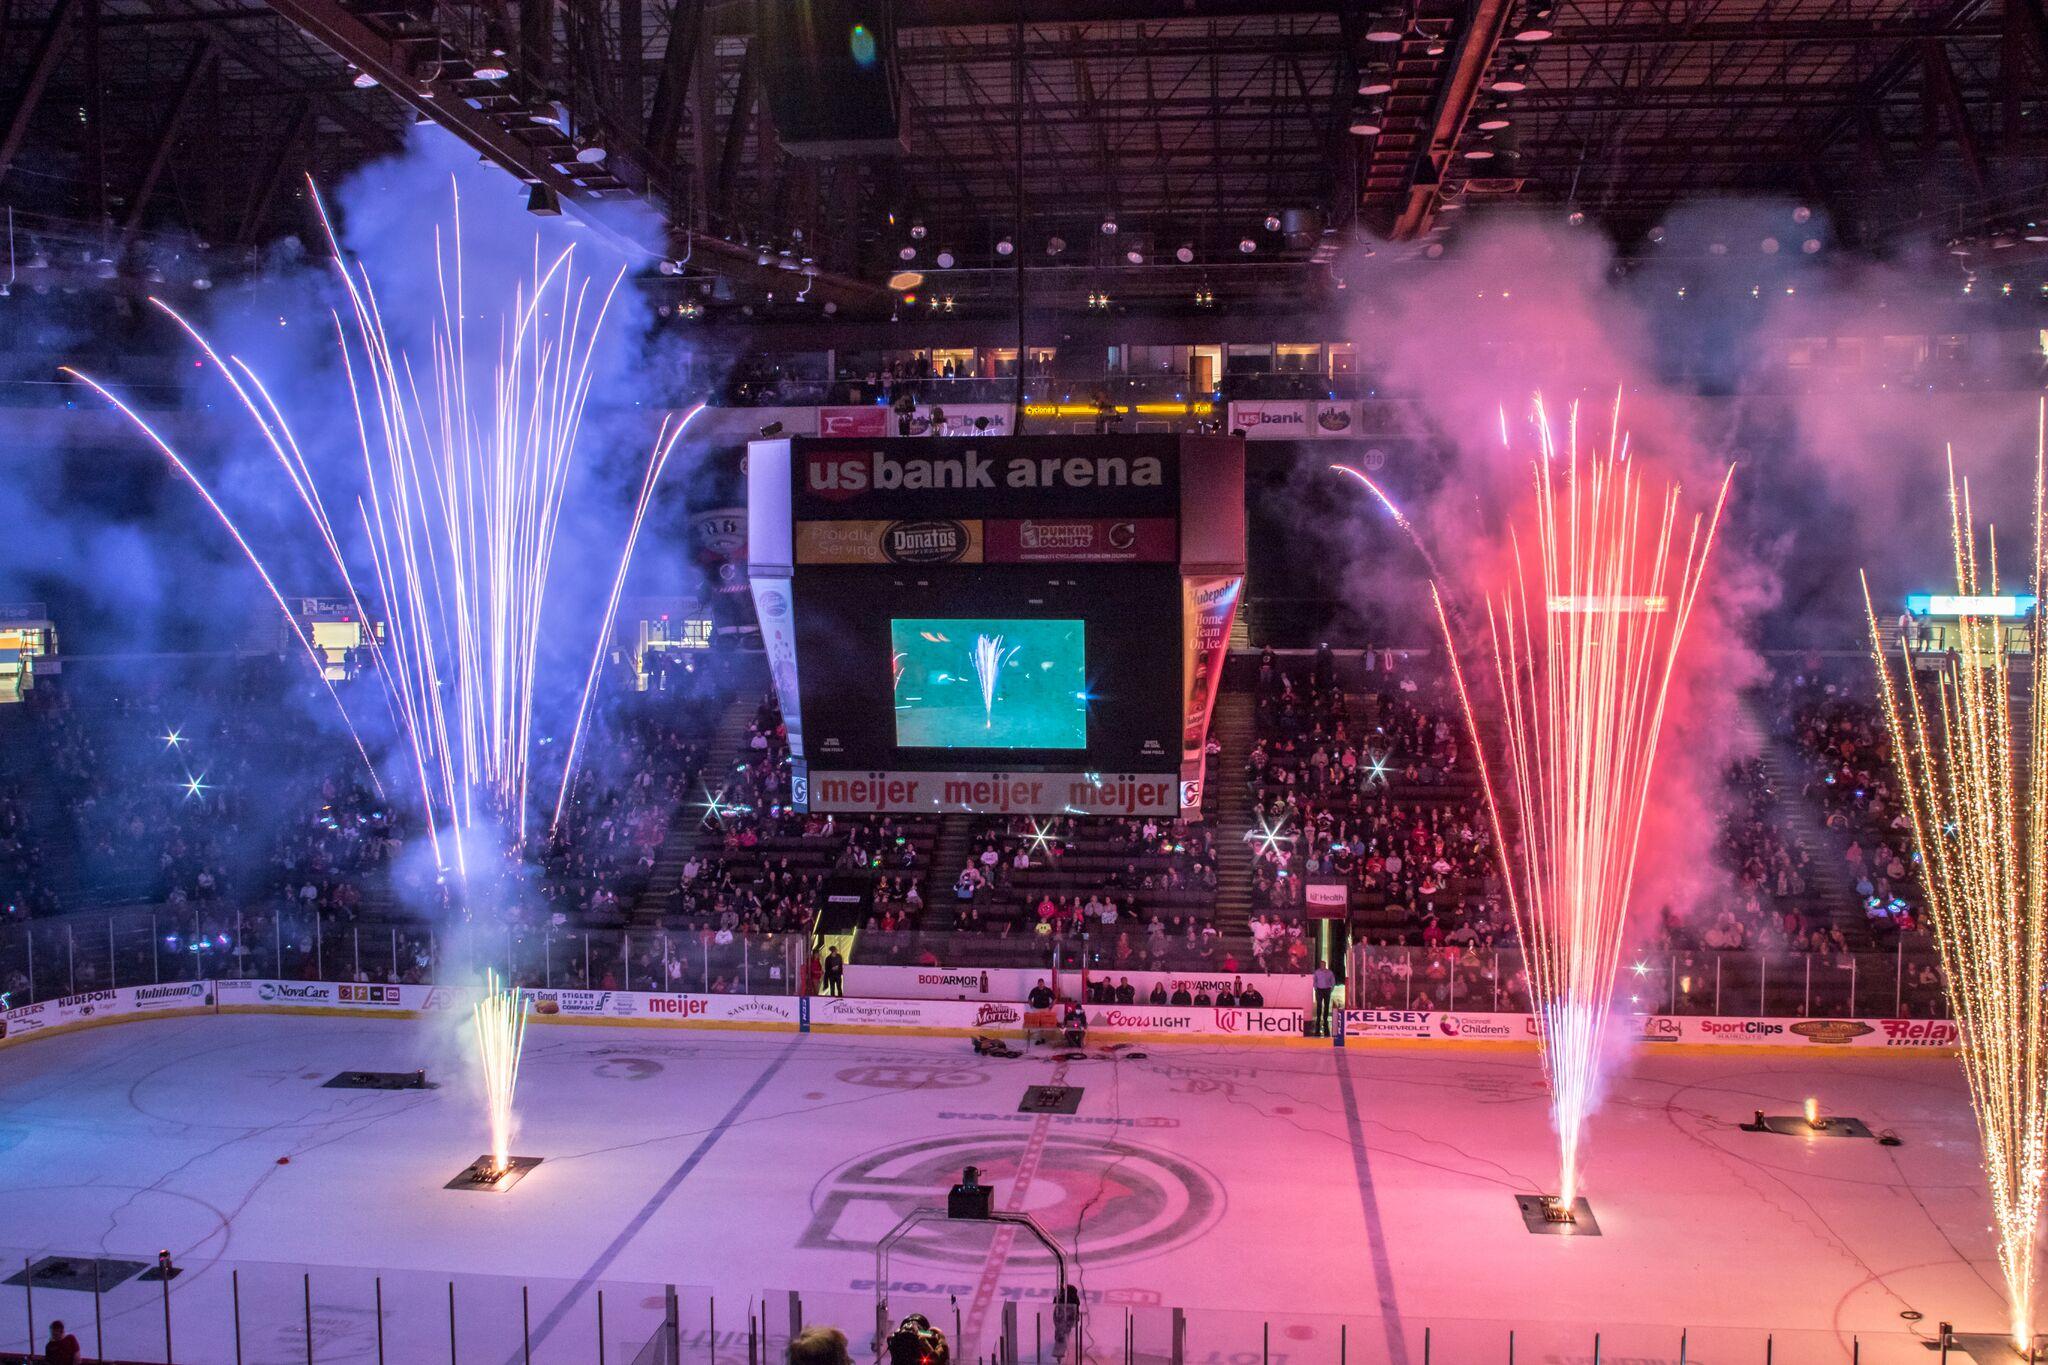 fireworks going off for Cincinnati Cyclones Hockey game